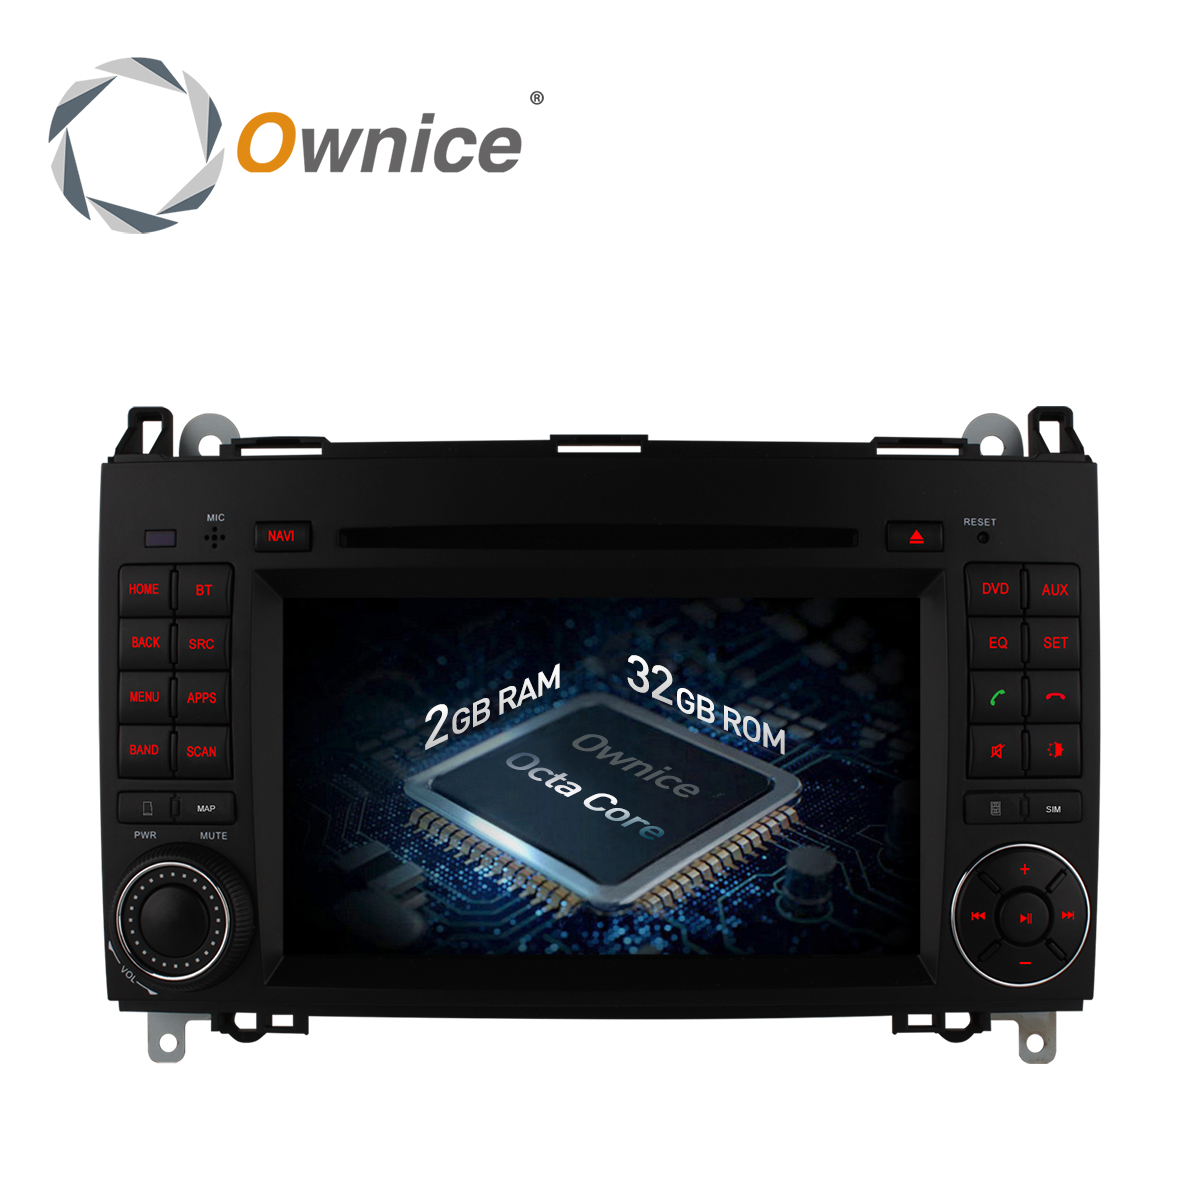 Ownice C500 Android 6,0 8 Core dvd-плеер автомобиля для Mercedes Sprinter W209 W169 W245 Viano Vito B-класс B150 B170 B200 A160 A180